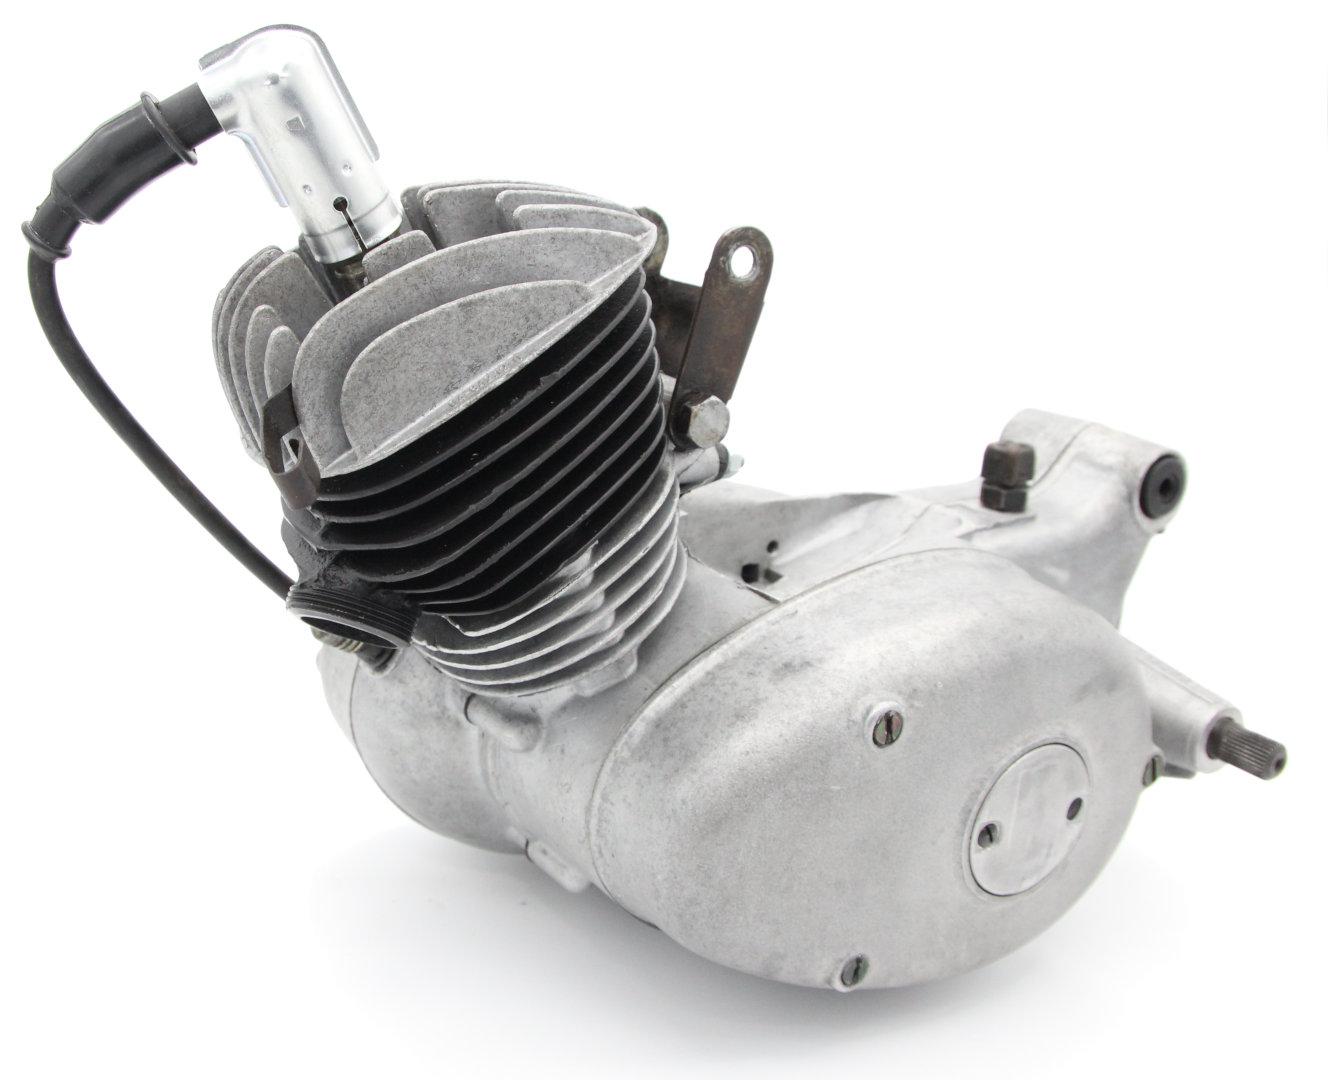 Simson SR1, SR2, KR50, SR4-1 Spatz (Rheinmetall, Soemtron)(Rh50, Rh50 II, KRo Rh50, Sö 4-1 P/K) Motor Regenerierung